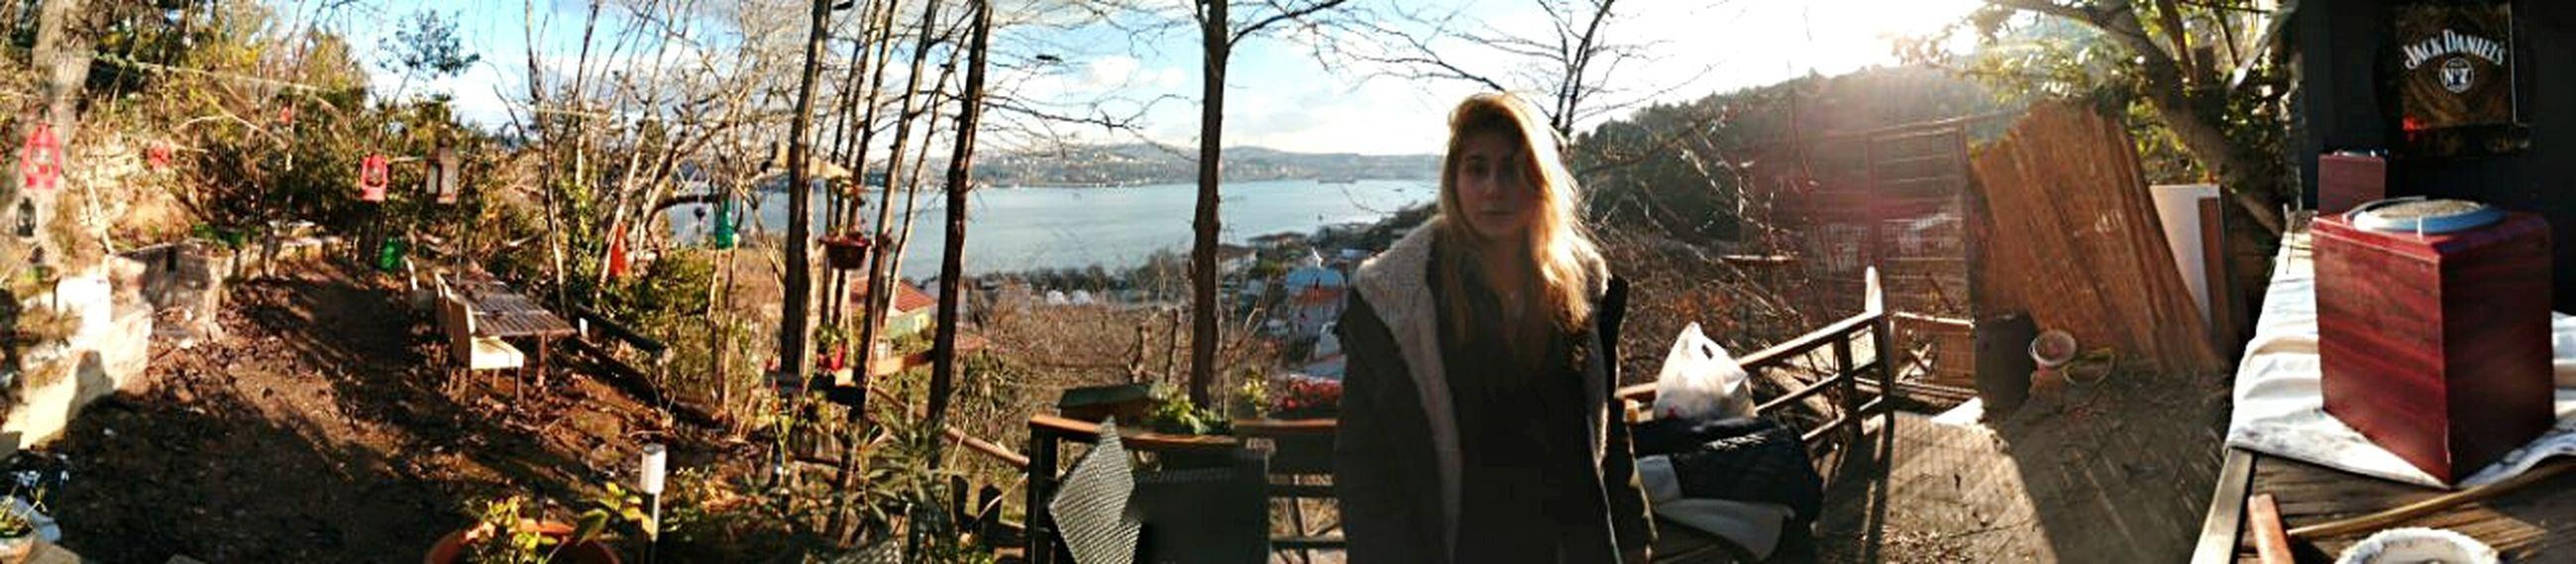 Outdoors Nature Sky Bosphorus Bridge Istanbul City Garden Photography Gardening Garden Bosphorus Bosphorus, Istanbul